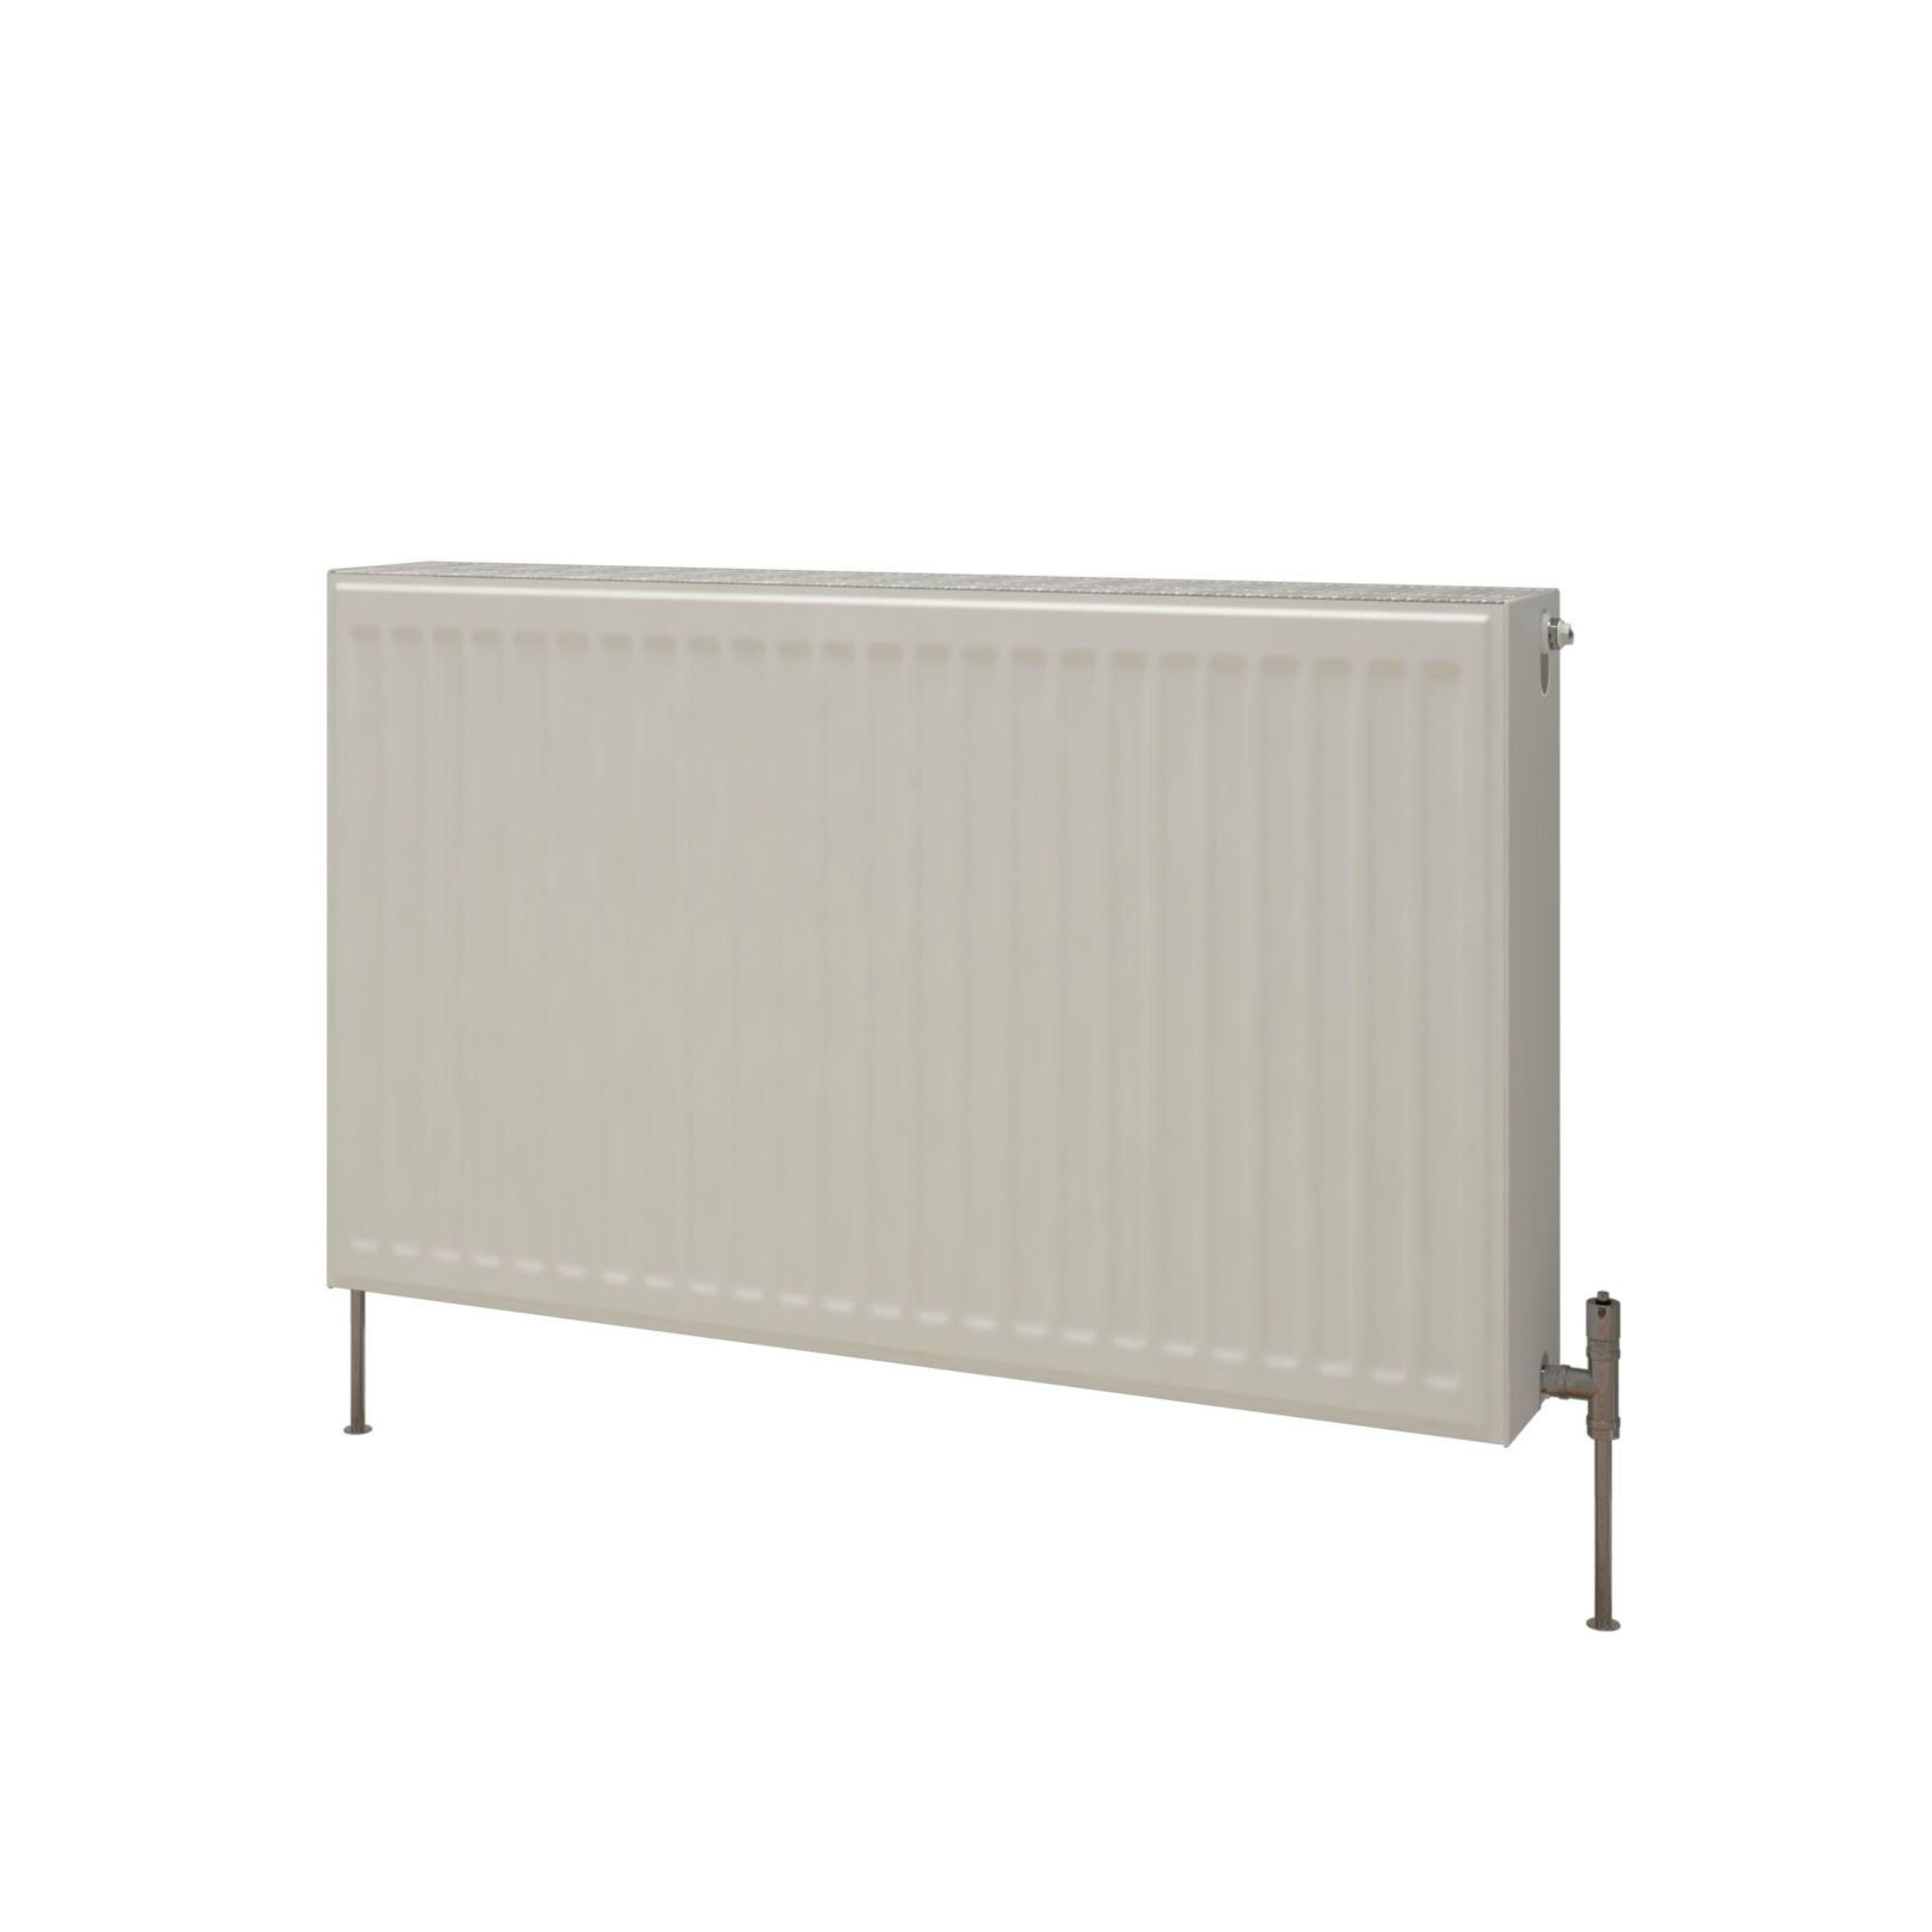 Kudox Type 11 single Panel radiator White, (H)500mm (W)1400mm ...